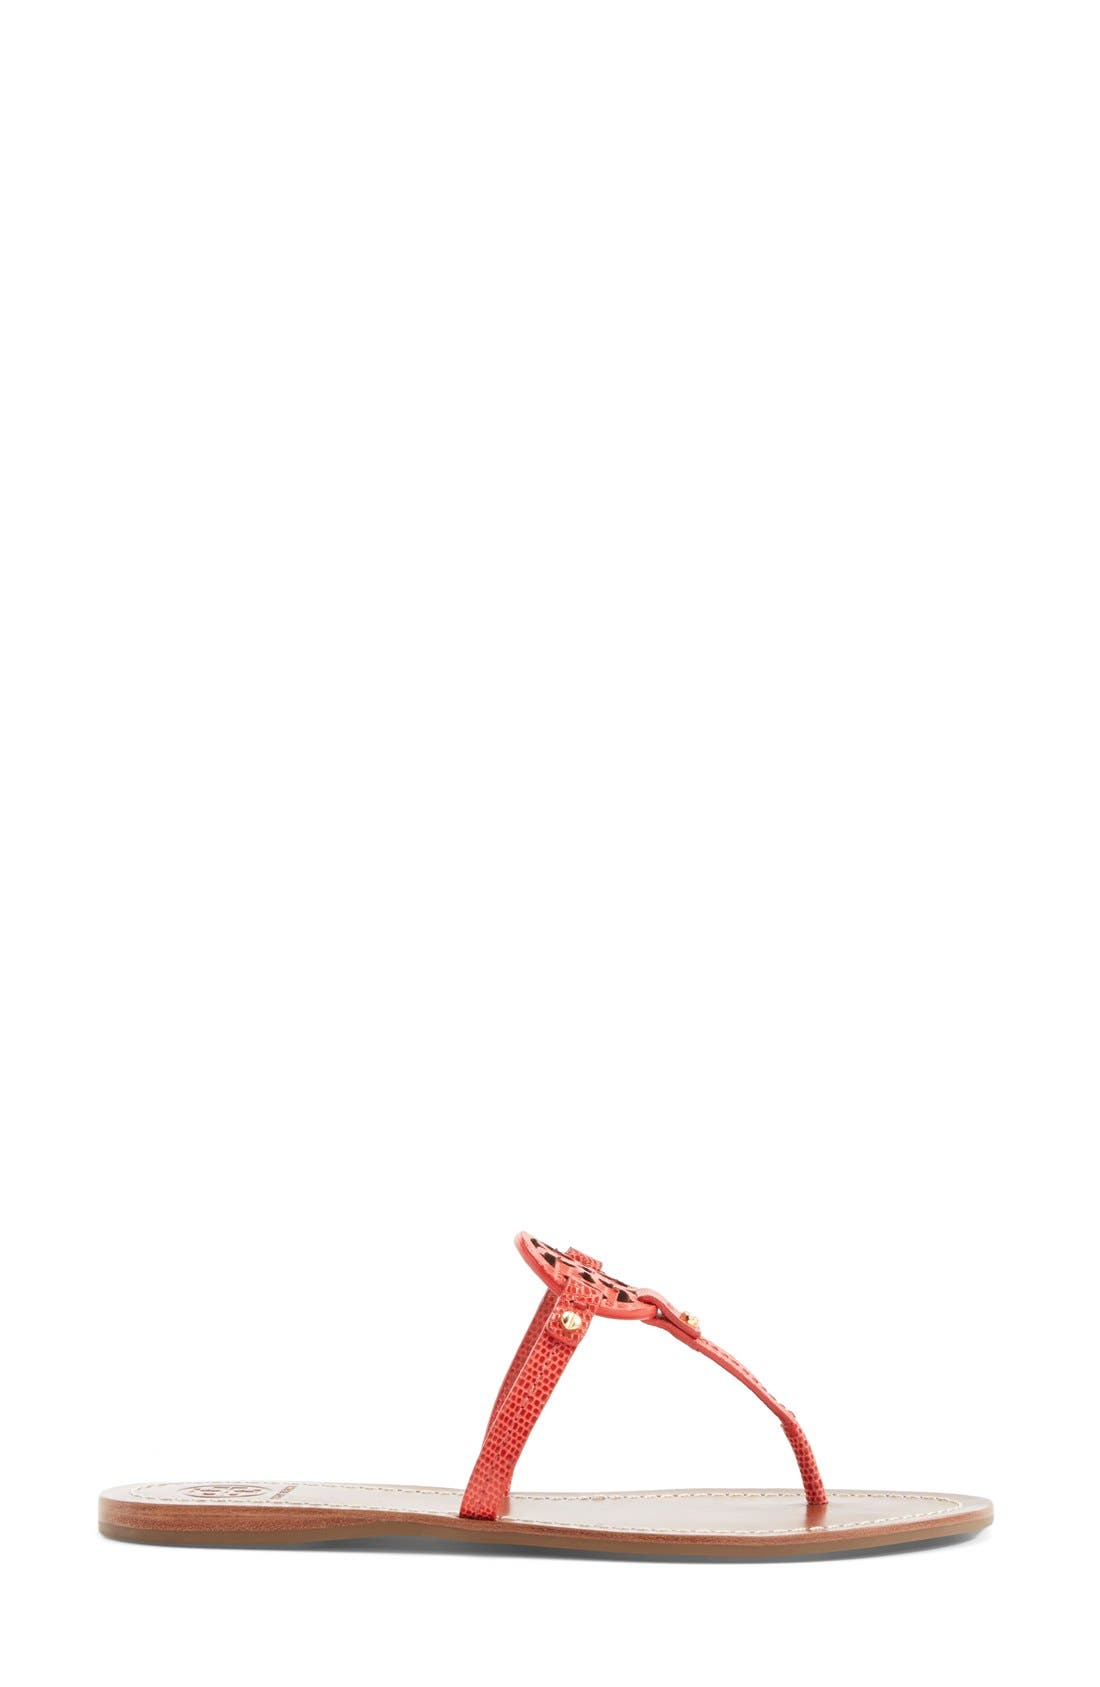 Alternate Image 4  - Tory Burch 'Mini Miller' Leather Thong Sandal (Women)